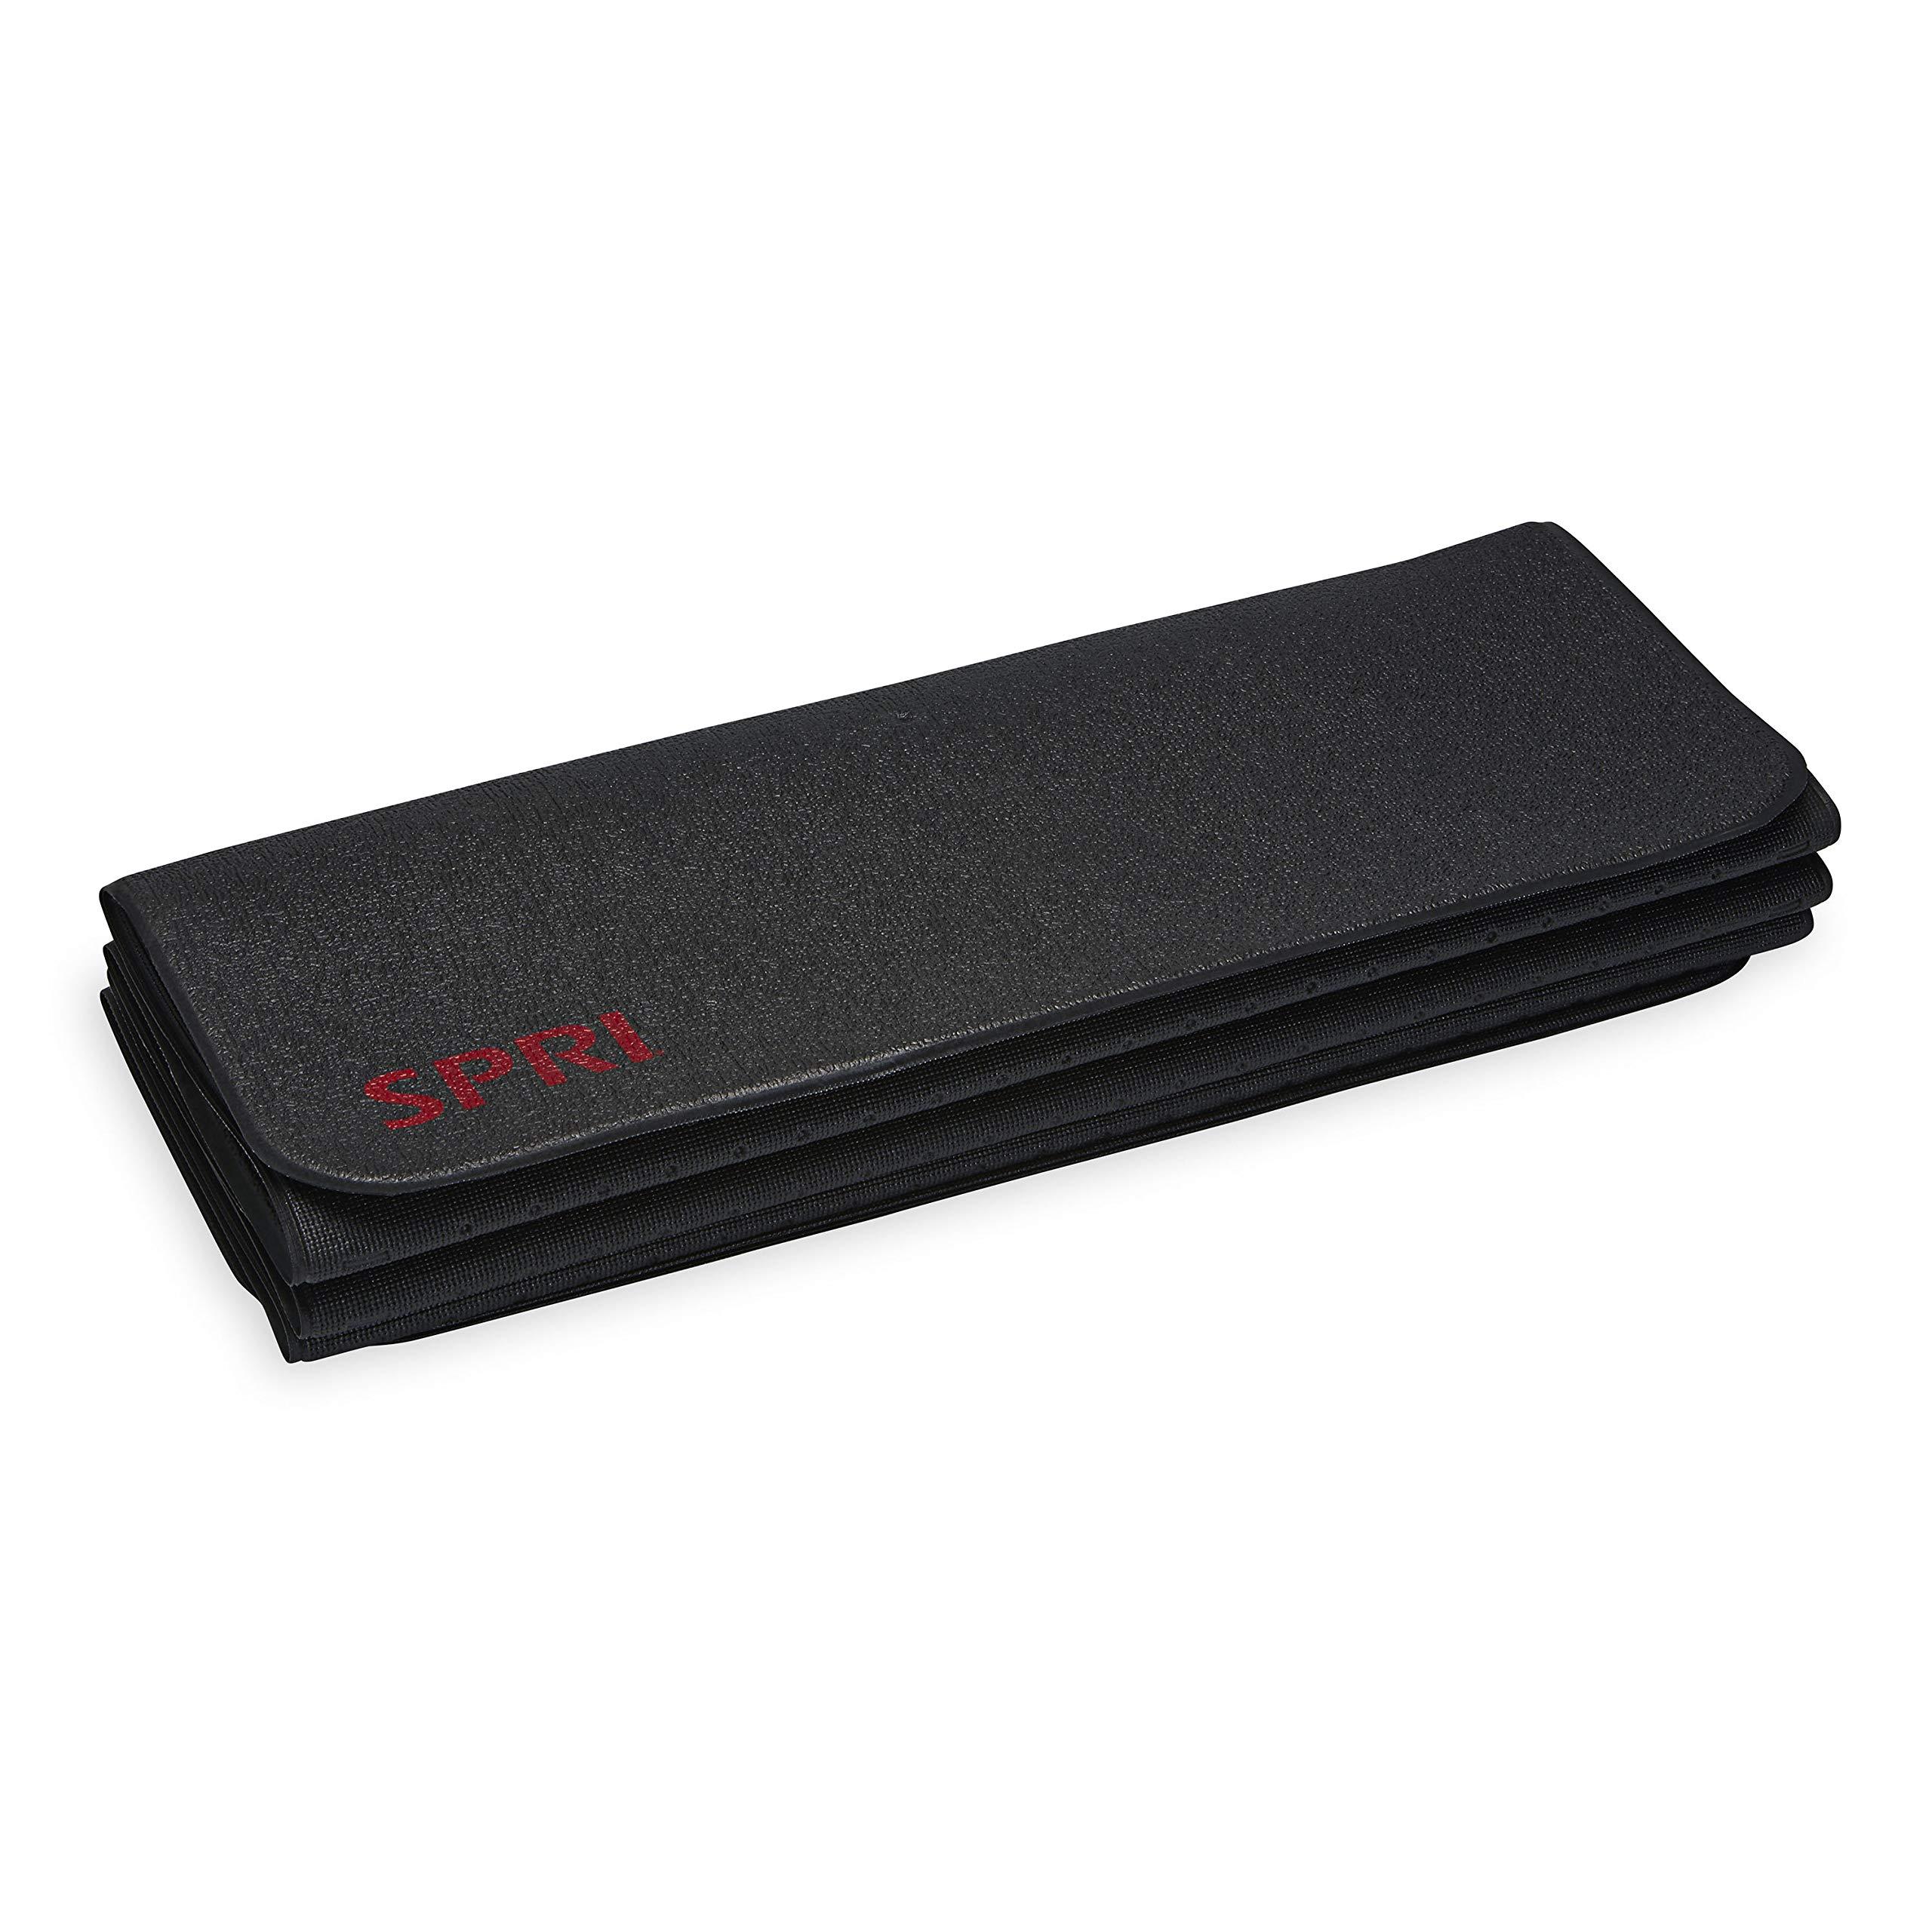 SPRI 运动垫可折叠 6 毫米厚高*泡沫健身和瑜伽垫72英寸(约182.9厘米)长(折叠至24英寸长 x 9英寸宽 x 2英寸高)